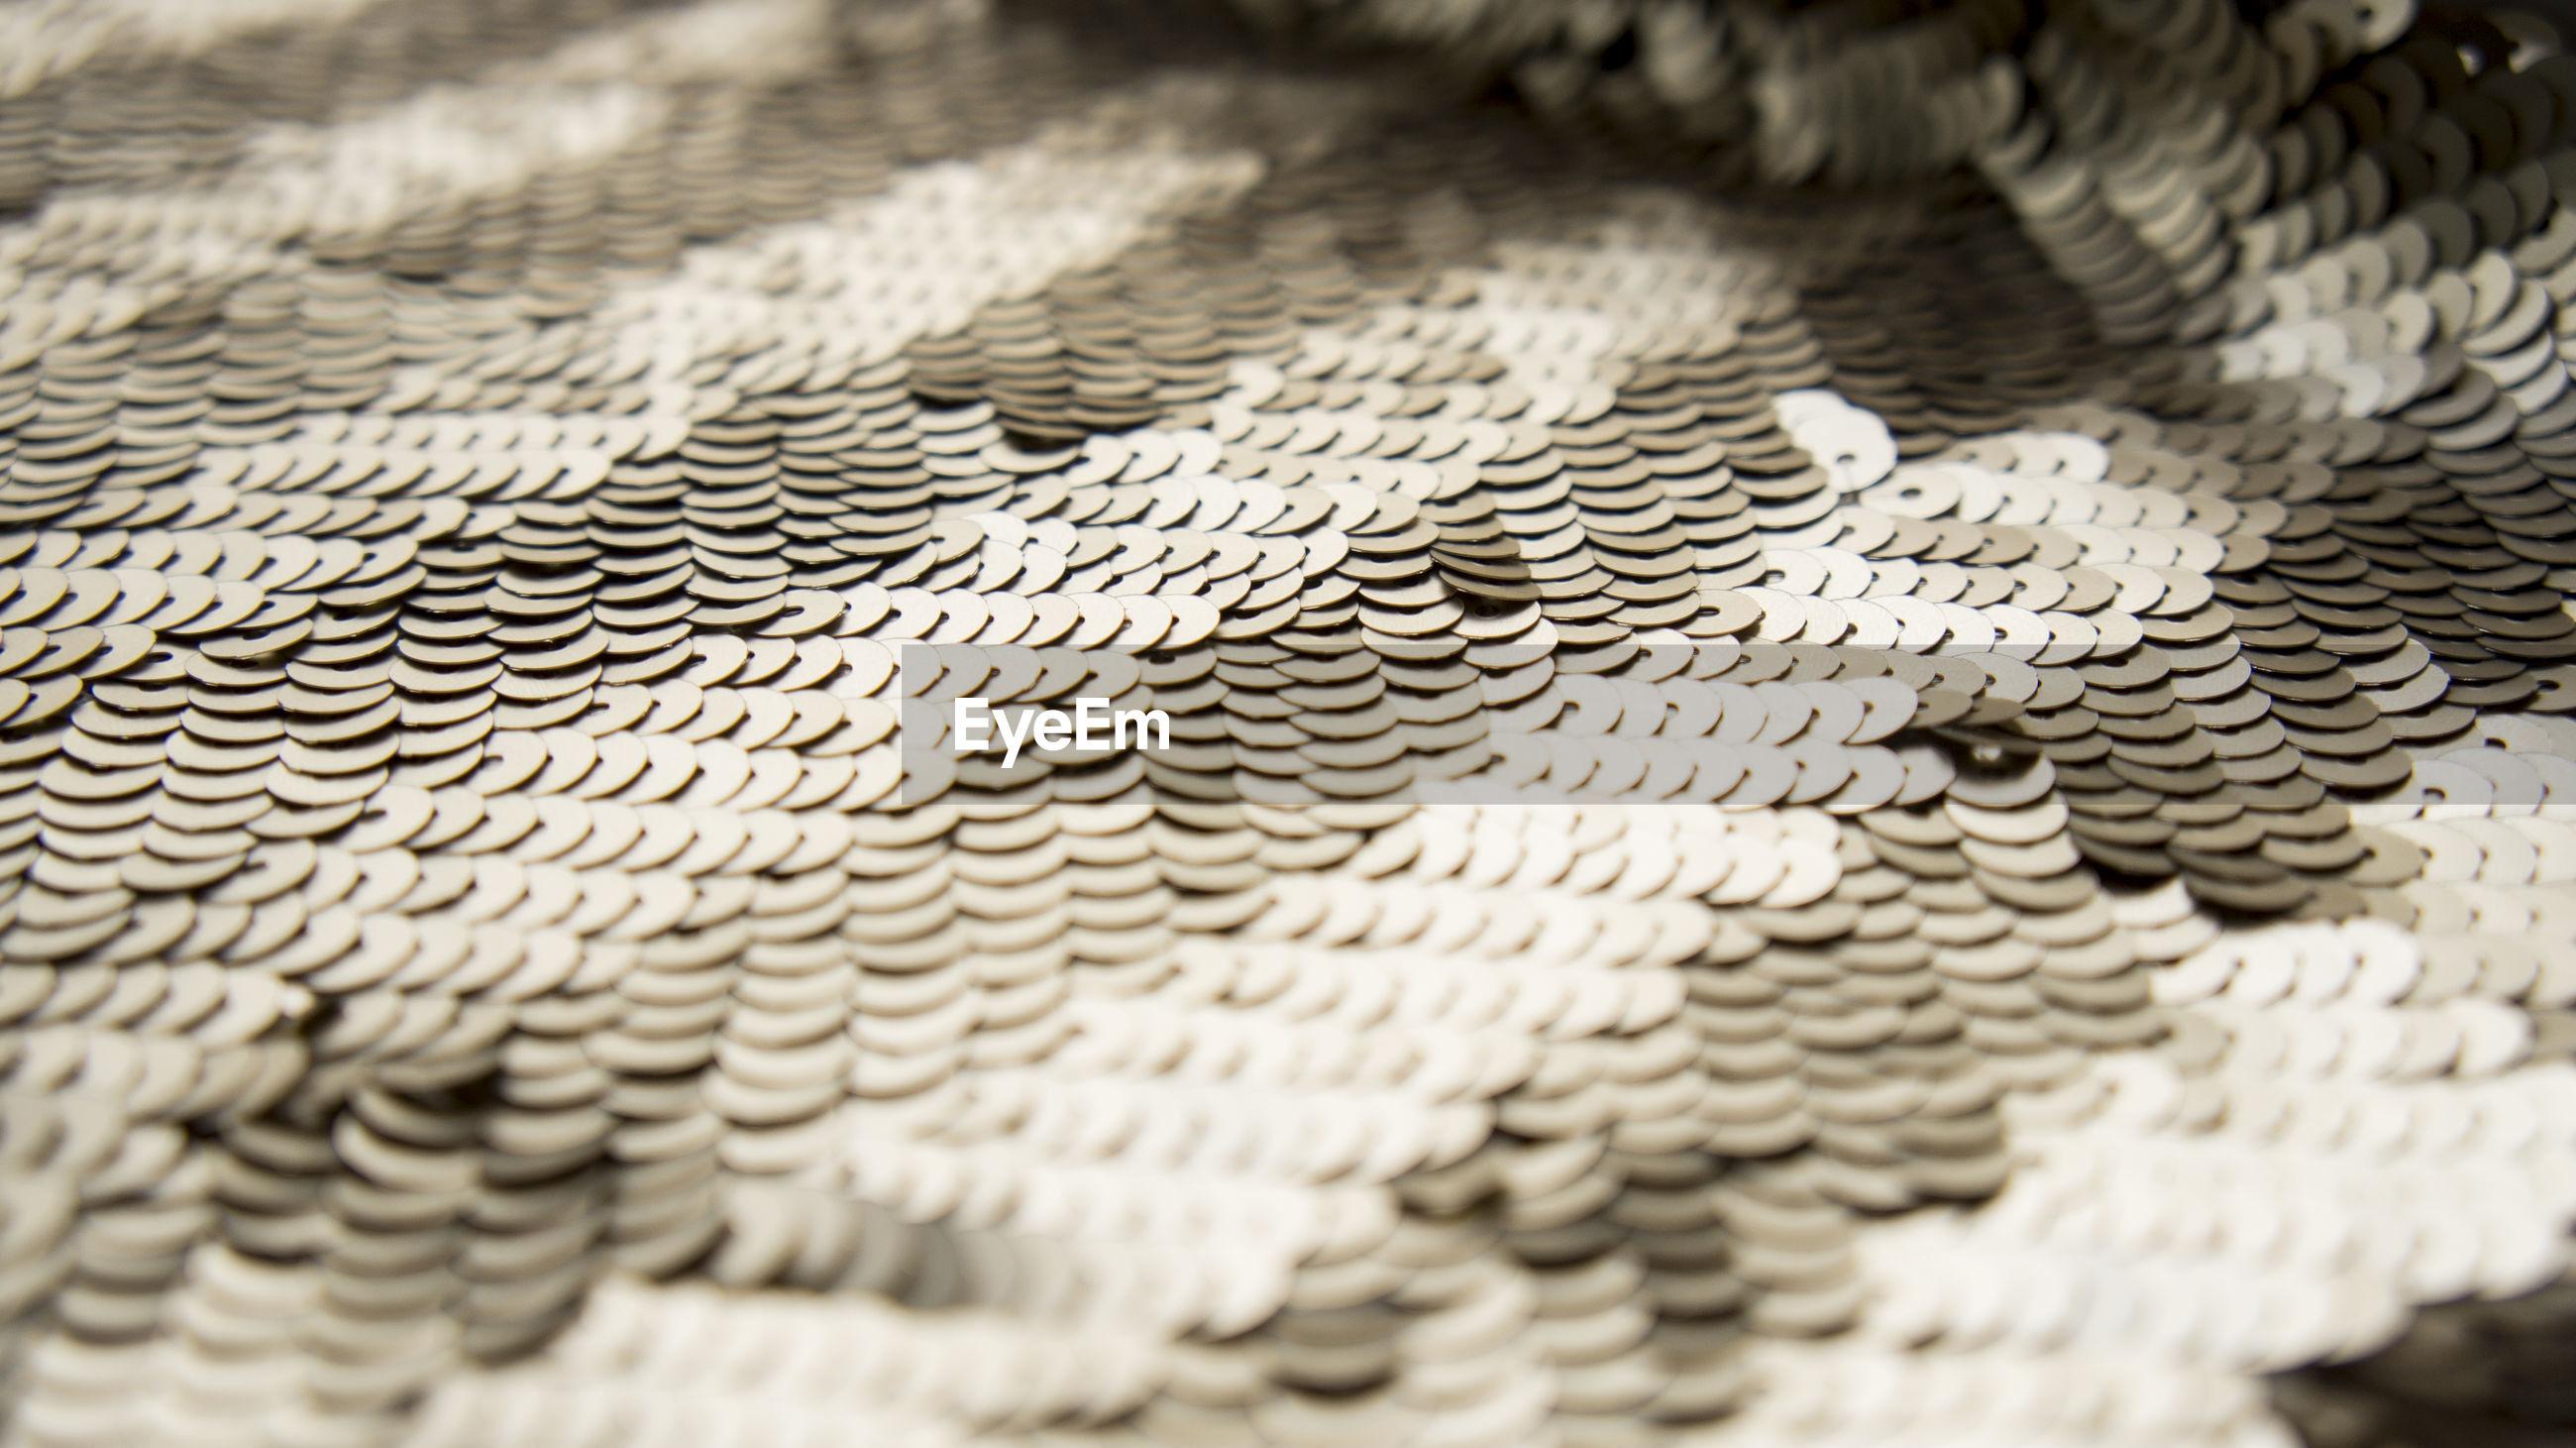 Full frame shot of sequins fabric